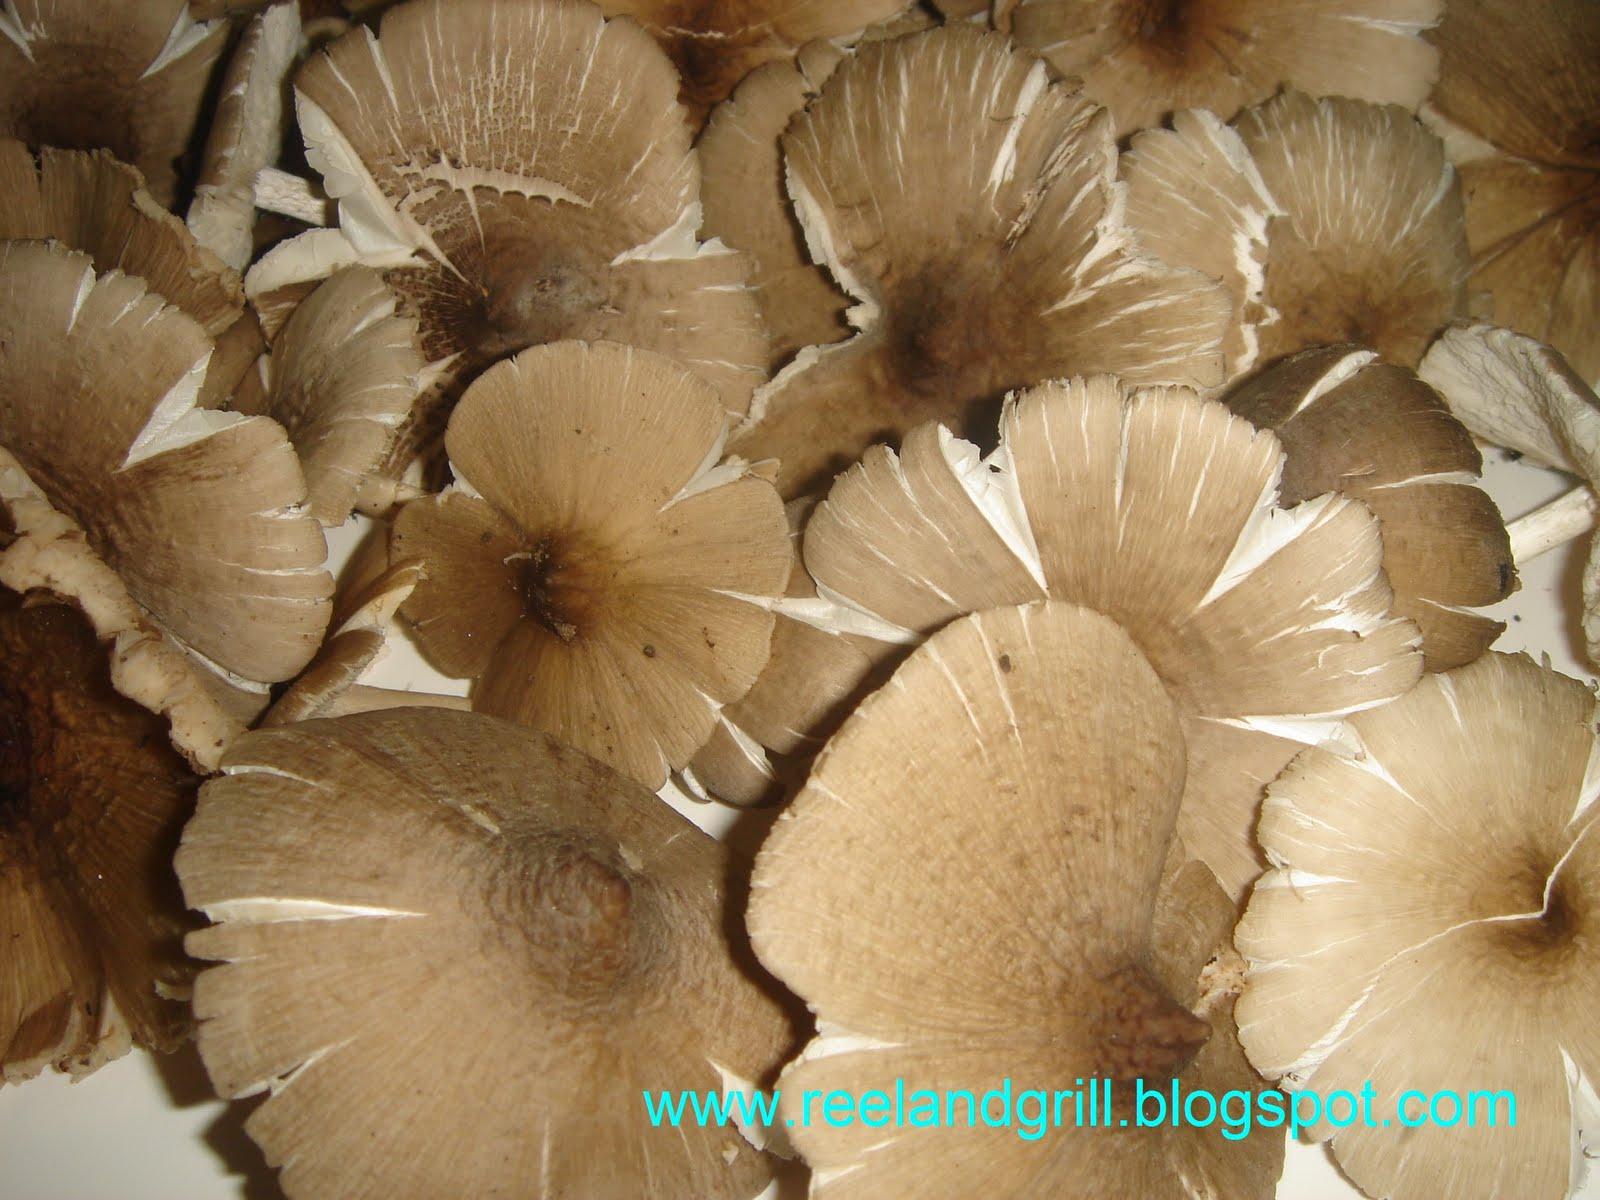 Mushroom Soup Reel And Grill Kabuteng Mamarang Tasty Wild Mushroom Soup